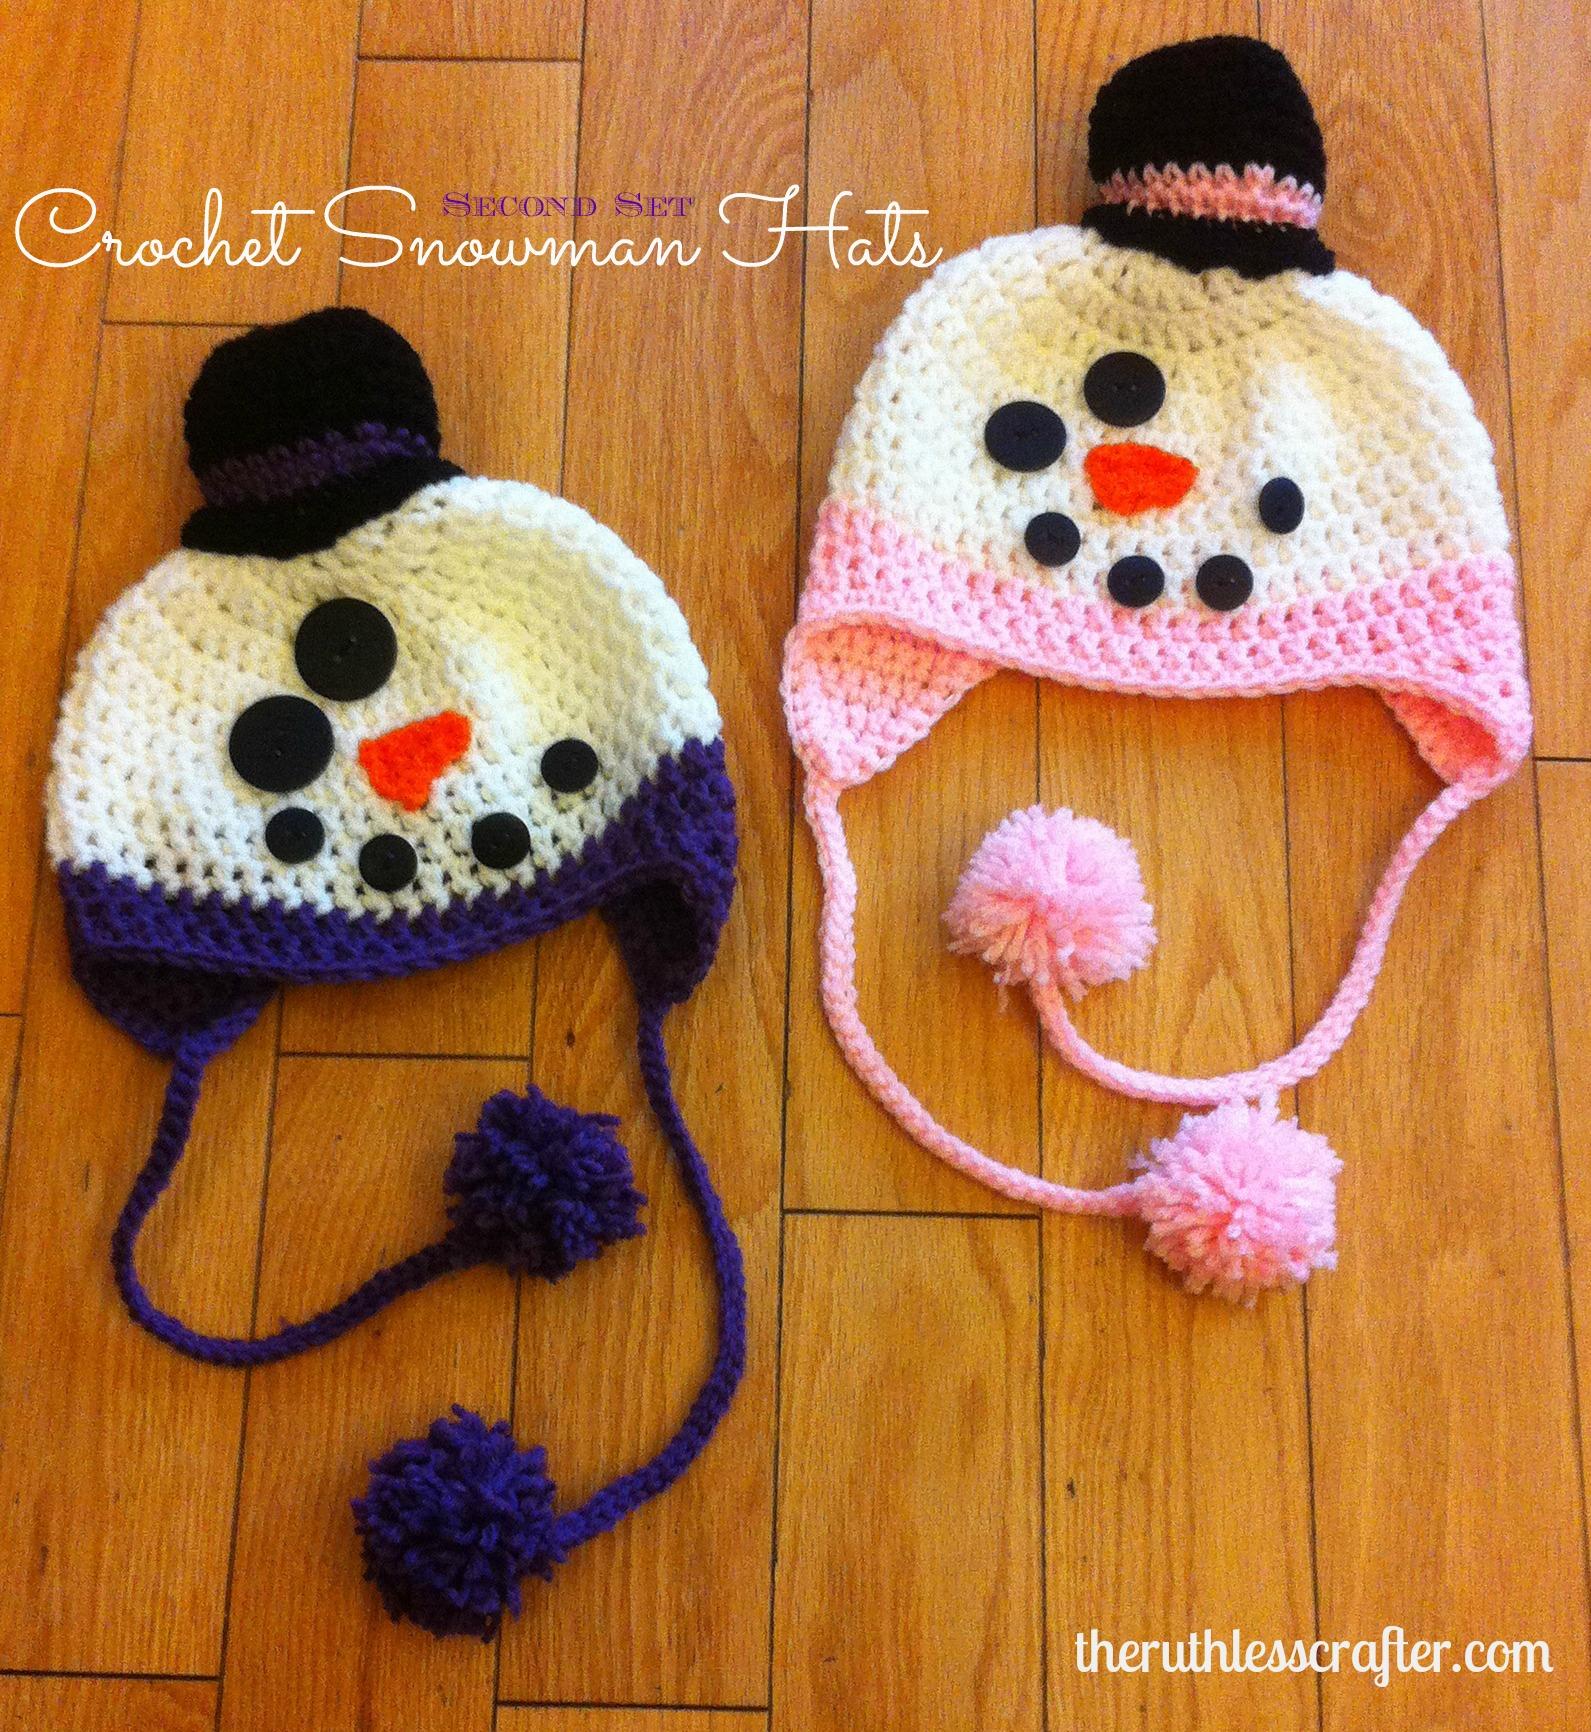 snowman hats #2 (2) EDITED